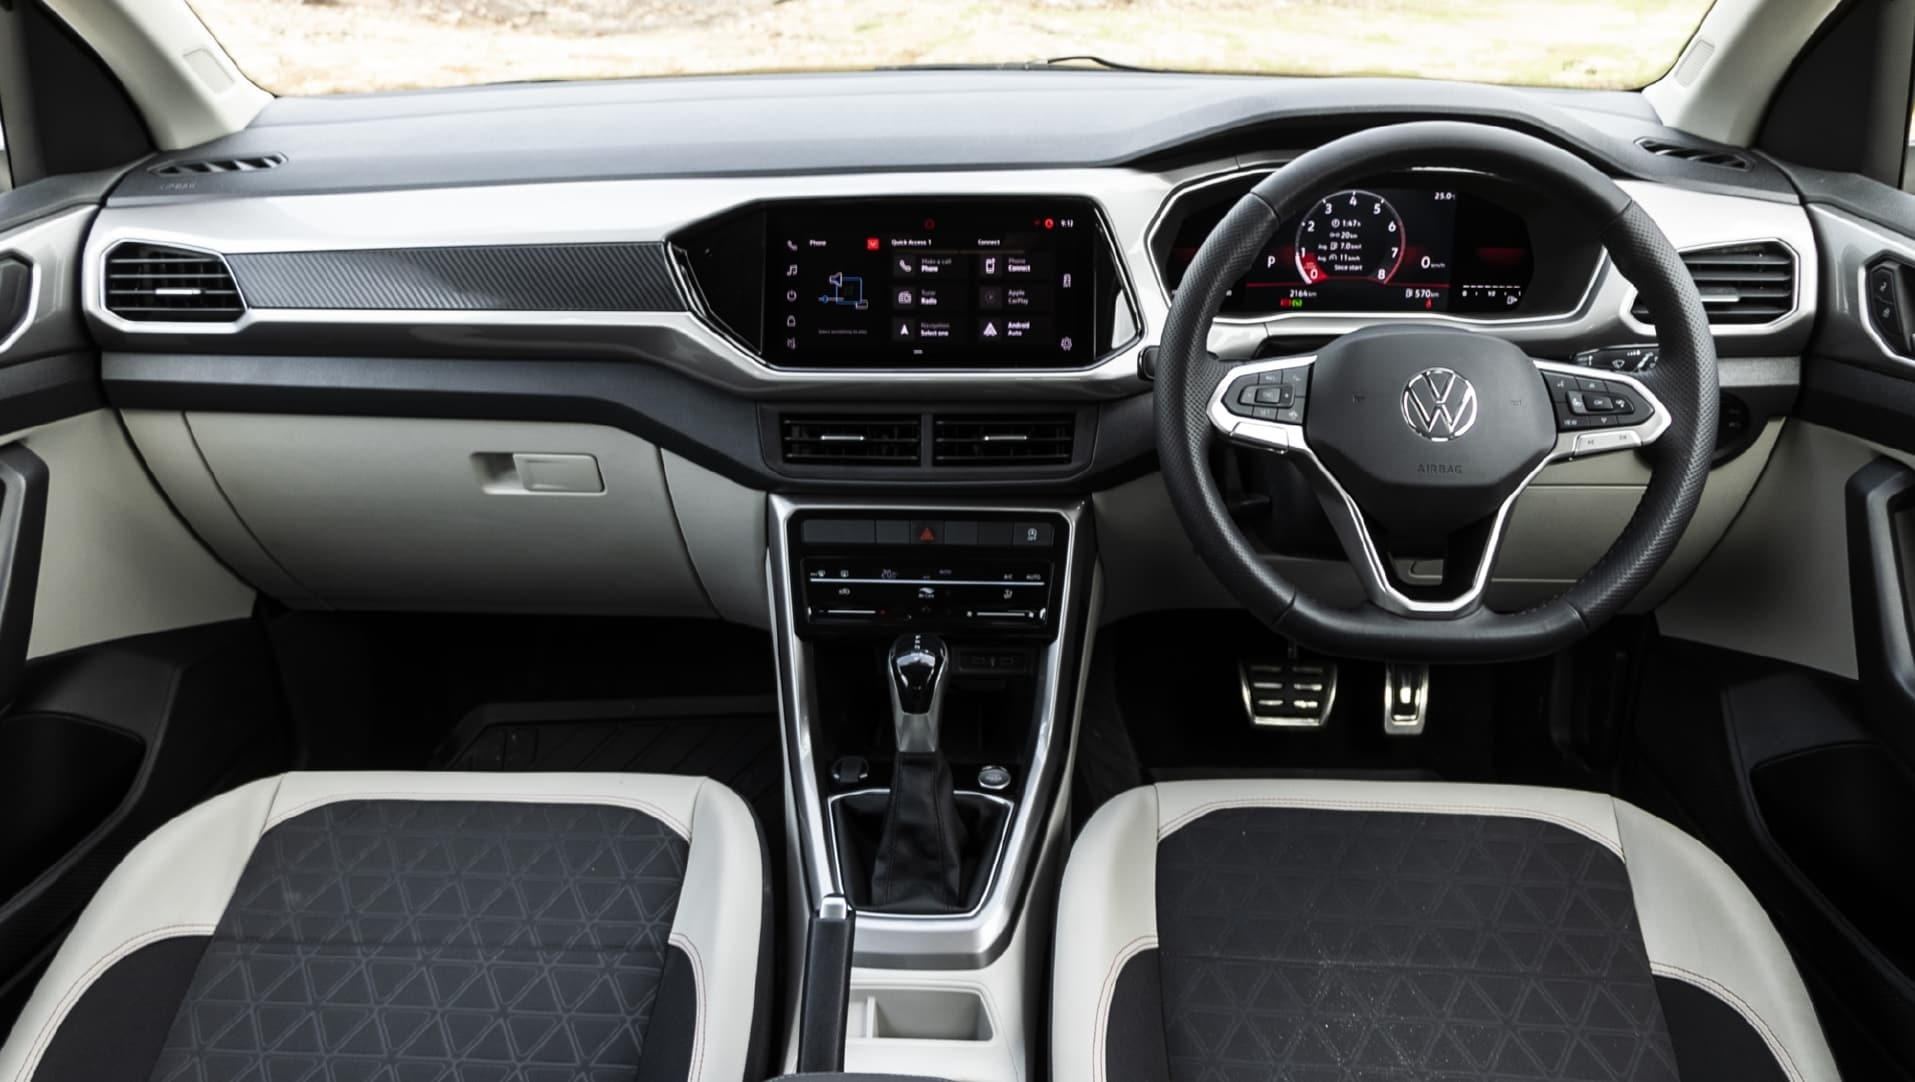 Volkswagen Taigun-এর দাম ১০.৪৯ লক্ষ টাকা(এক্স-শোরুম)। টপ-এন্ড মডেলটির দাম ১৭.৪৯ লক্ষ টাকা(এক্স-শোরুম)। ছবি : ভোক্সওয়াগেন (Volkswagen)